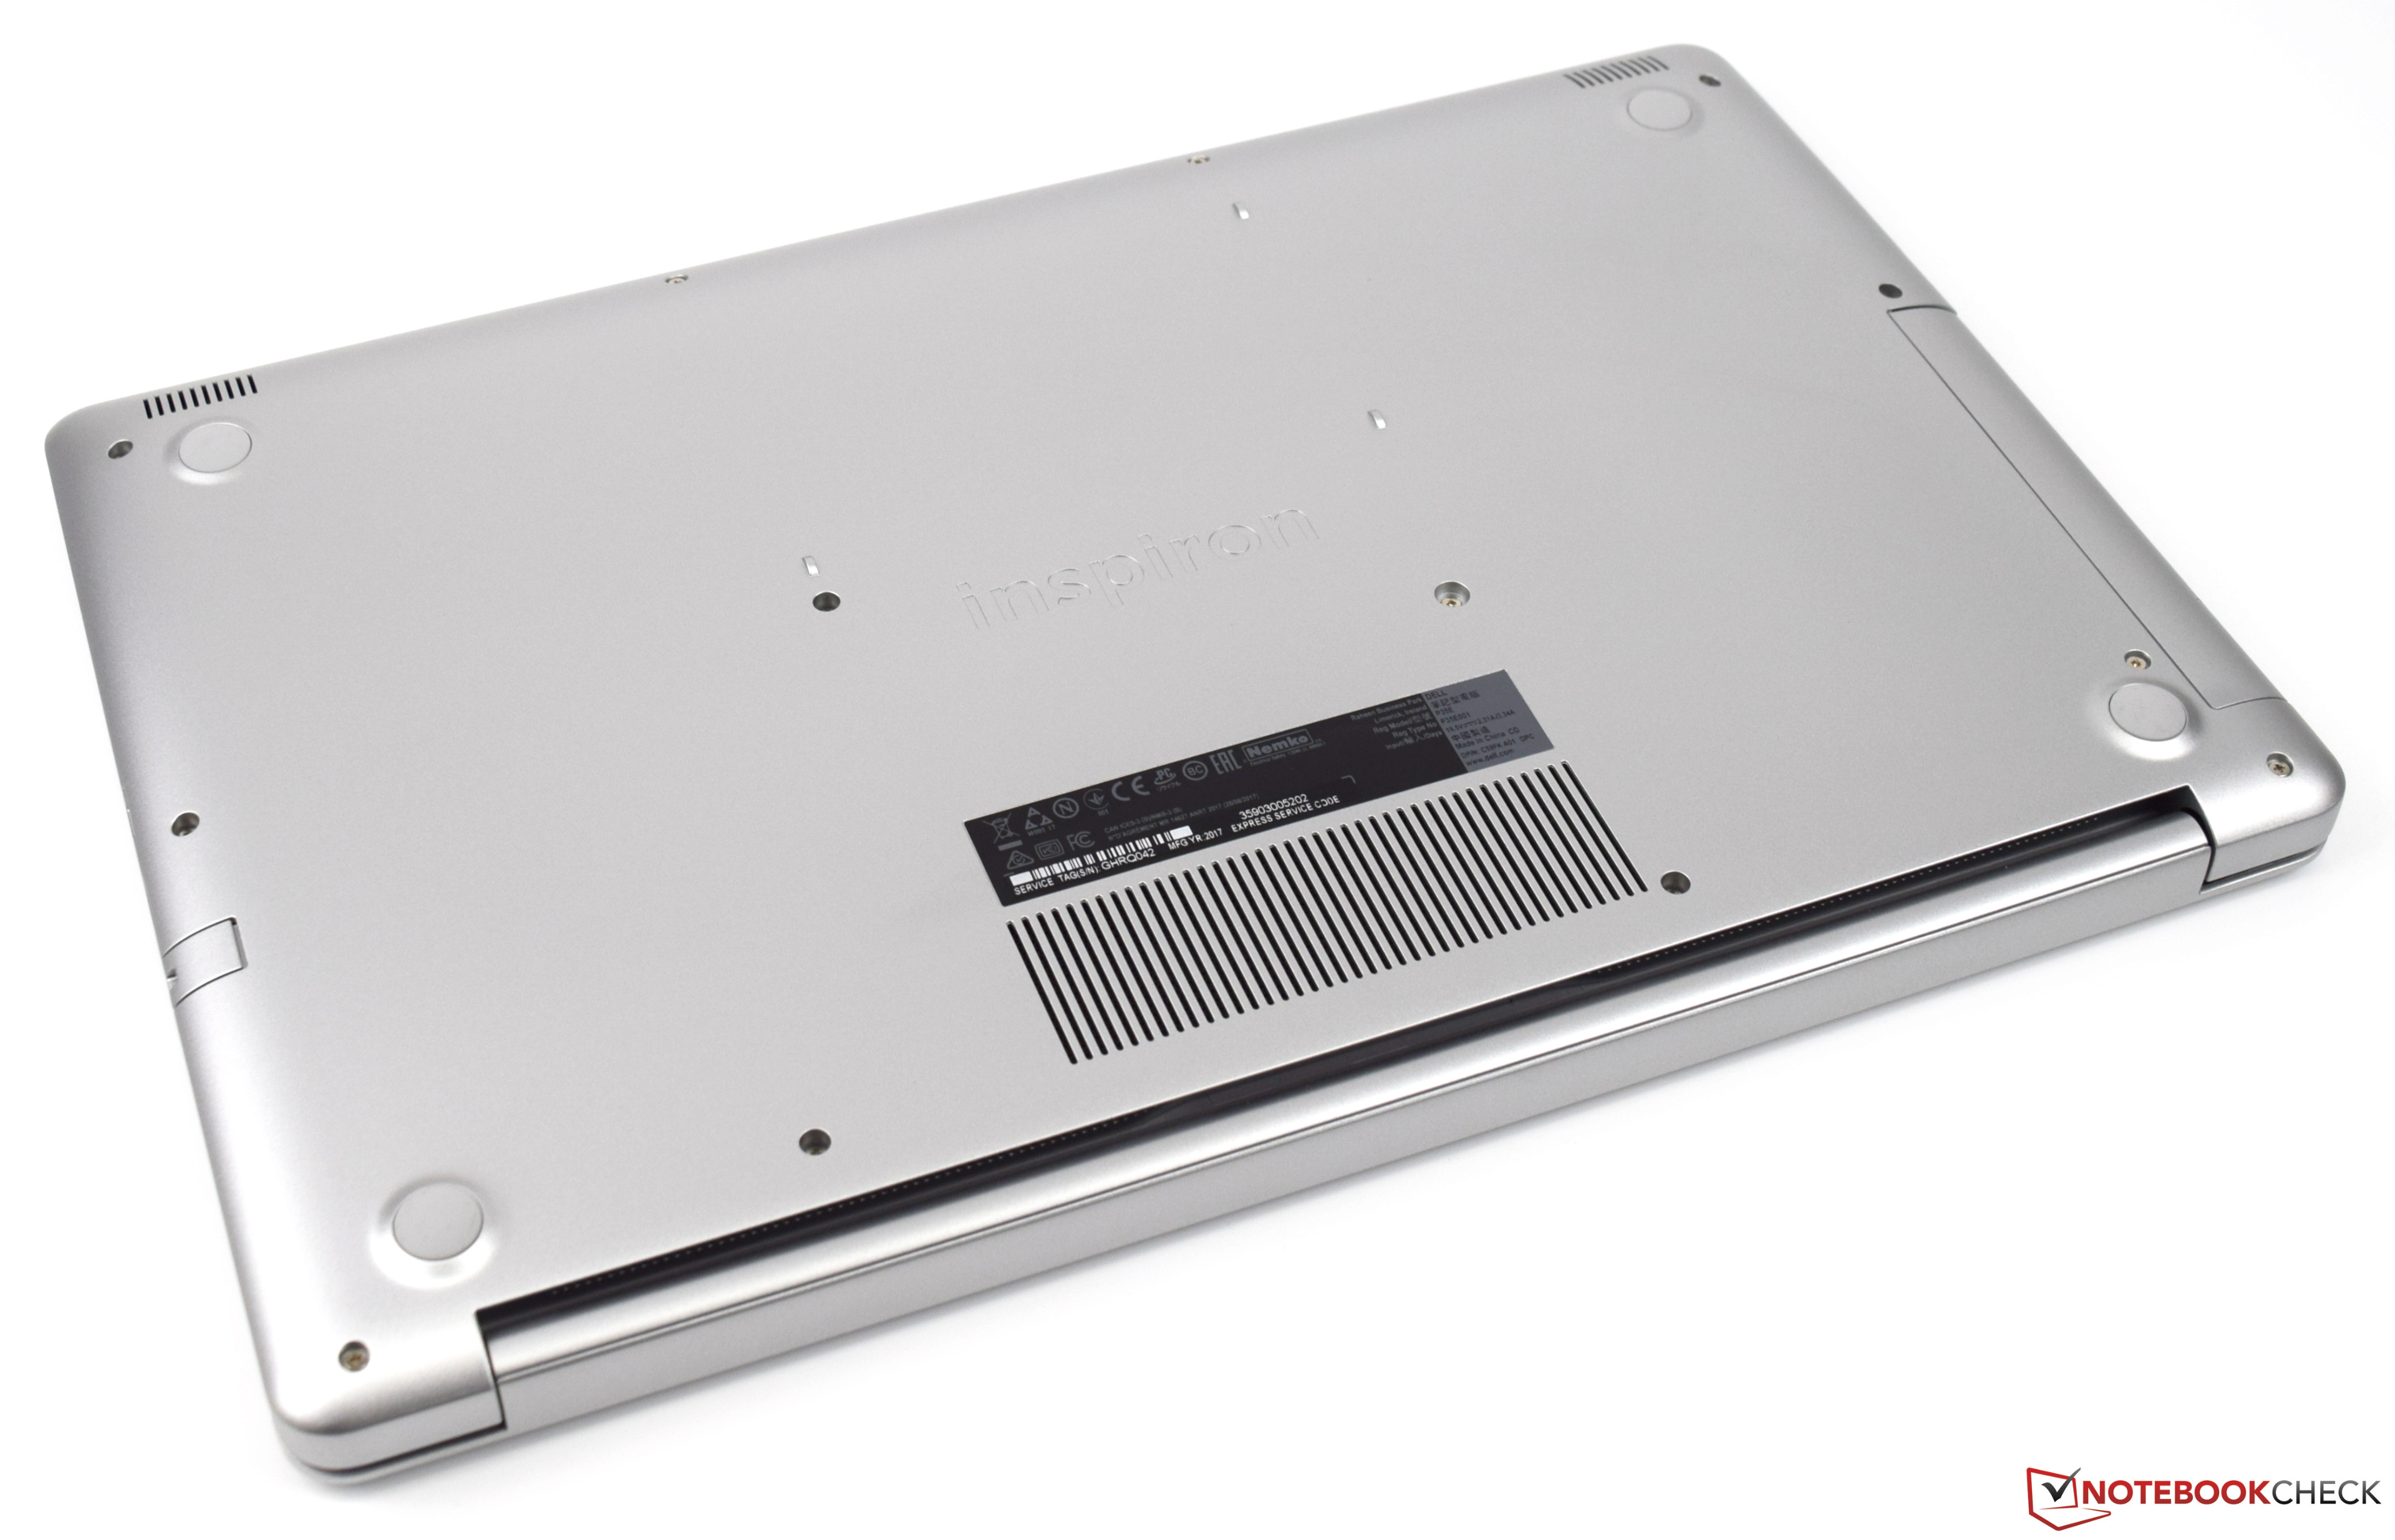 f49742d257dd Dell Inspiron 17-5770-0357 (8250U, SSD, HDD, FHD) Laptop rövid ...